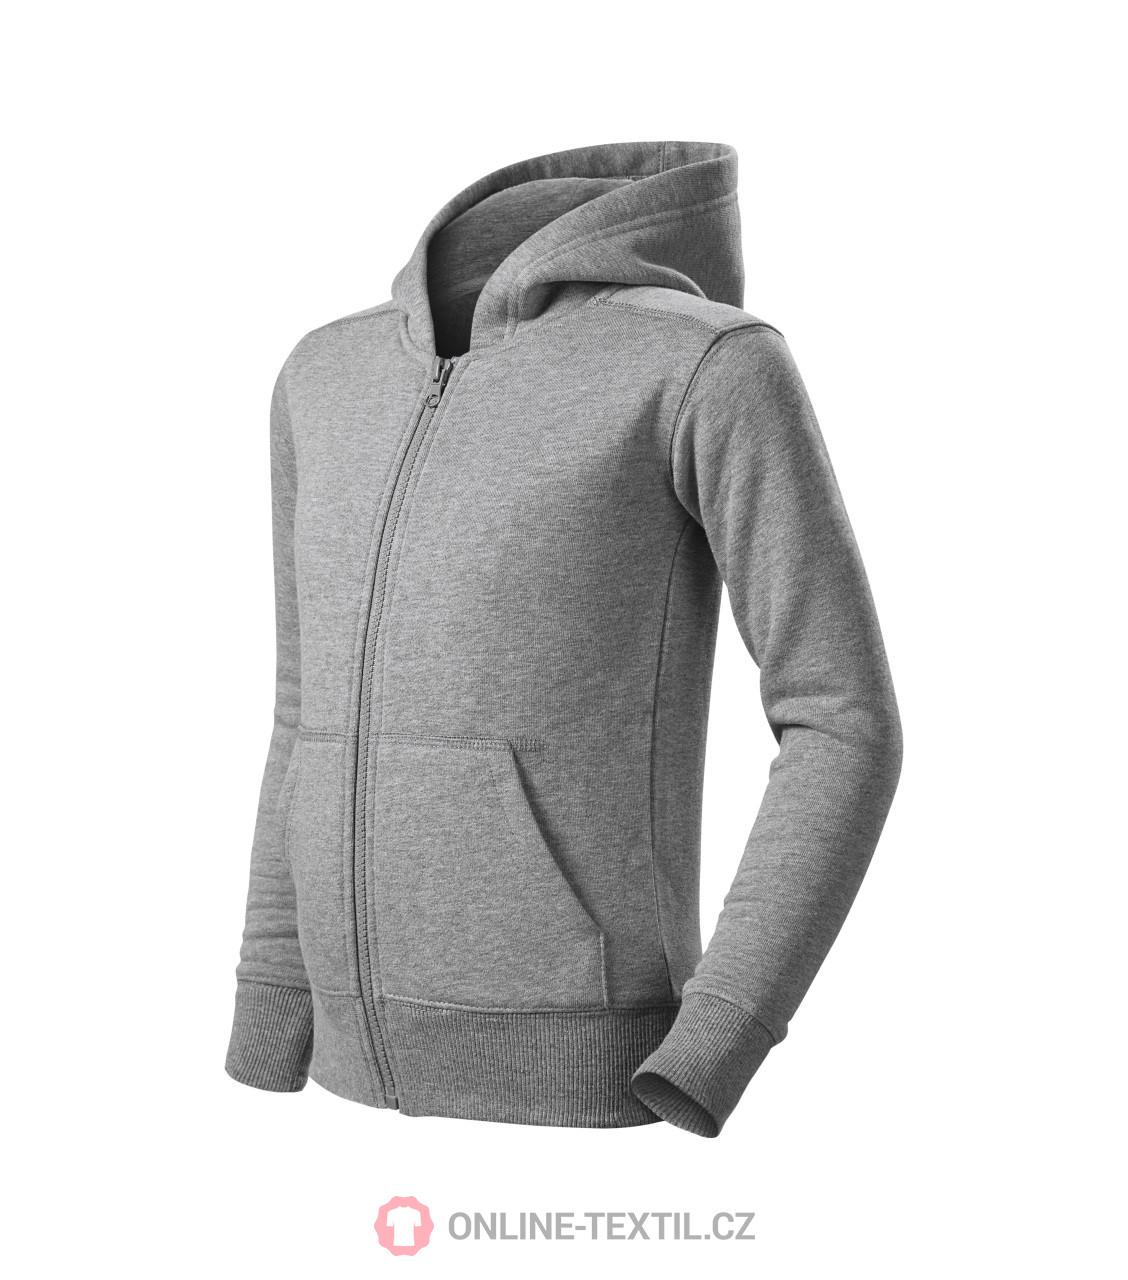 309d82099 ADLER CZECH Kids sweatshirt Trendy Zipper with hood 412 - dark gray ...